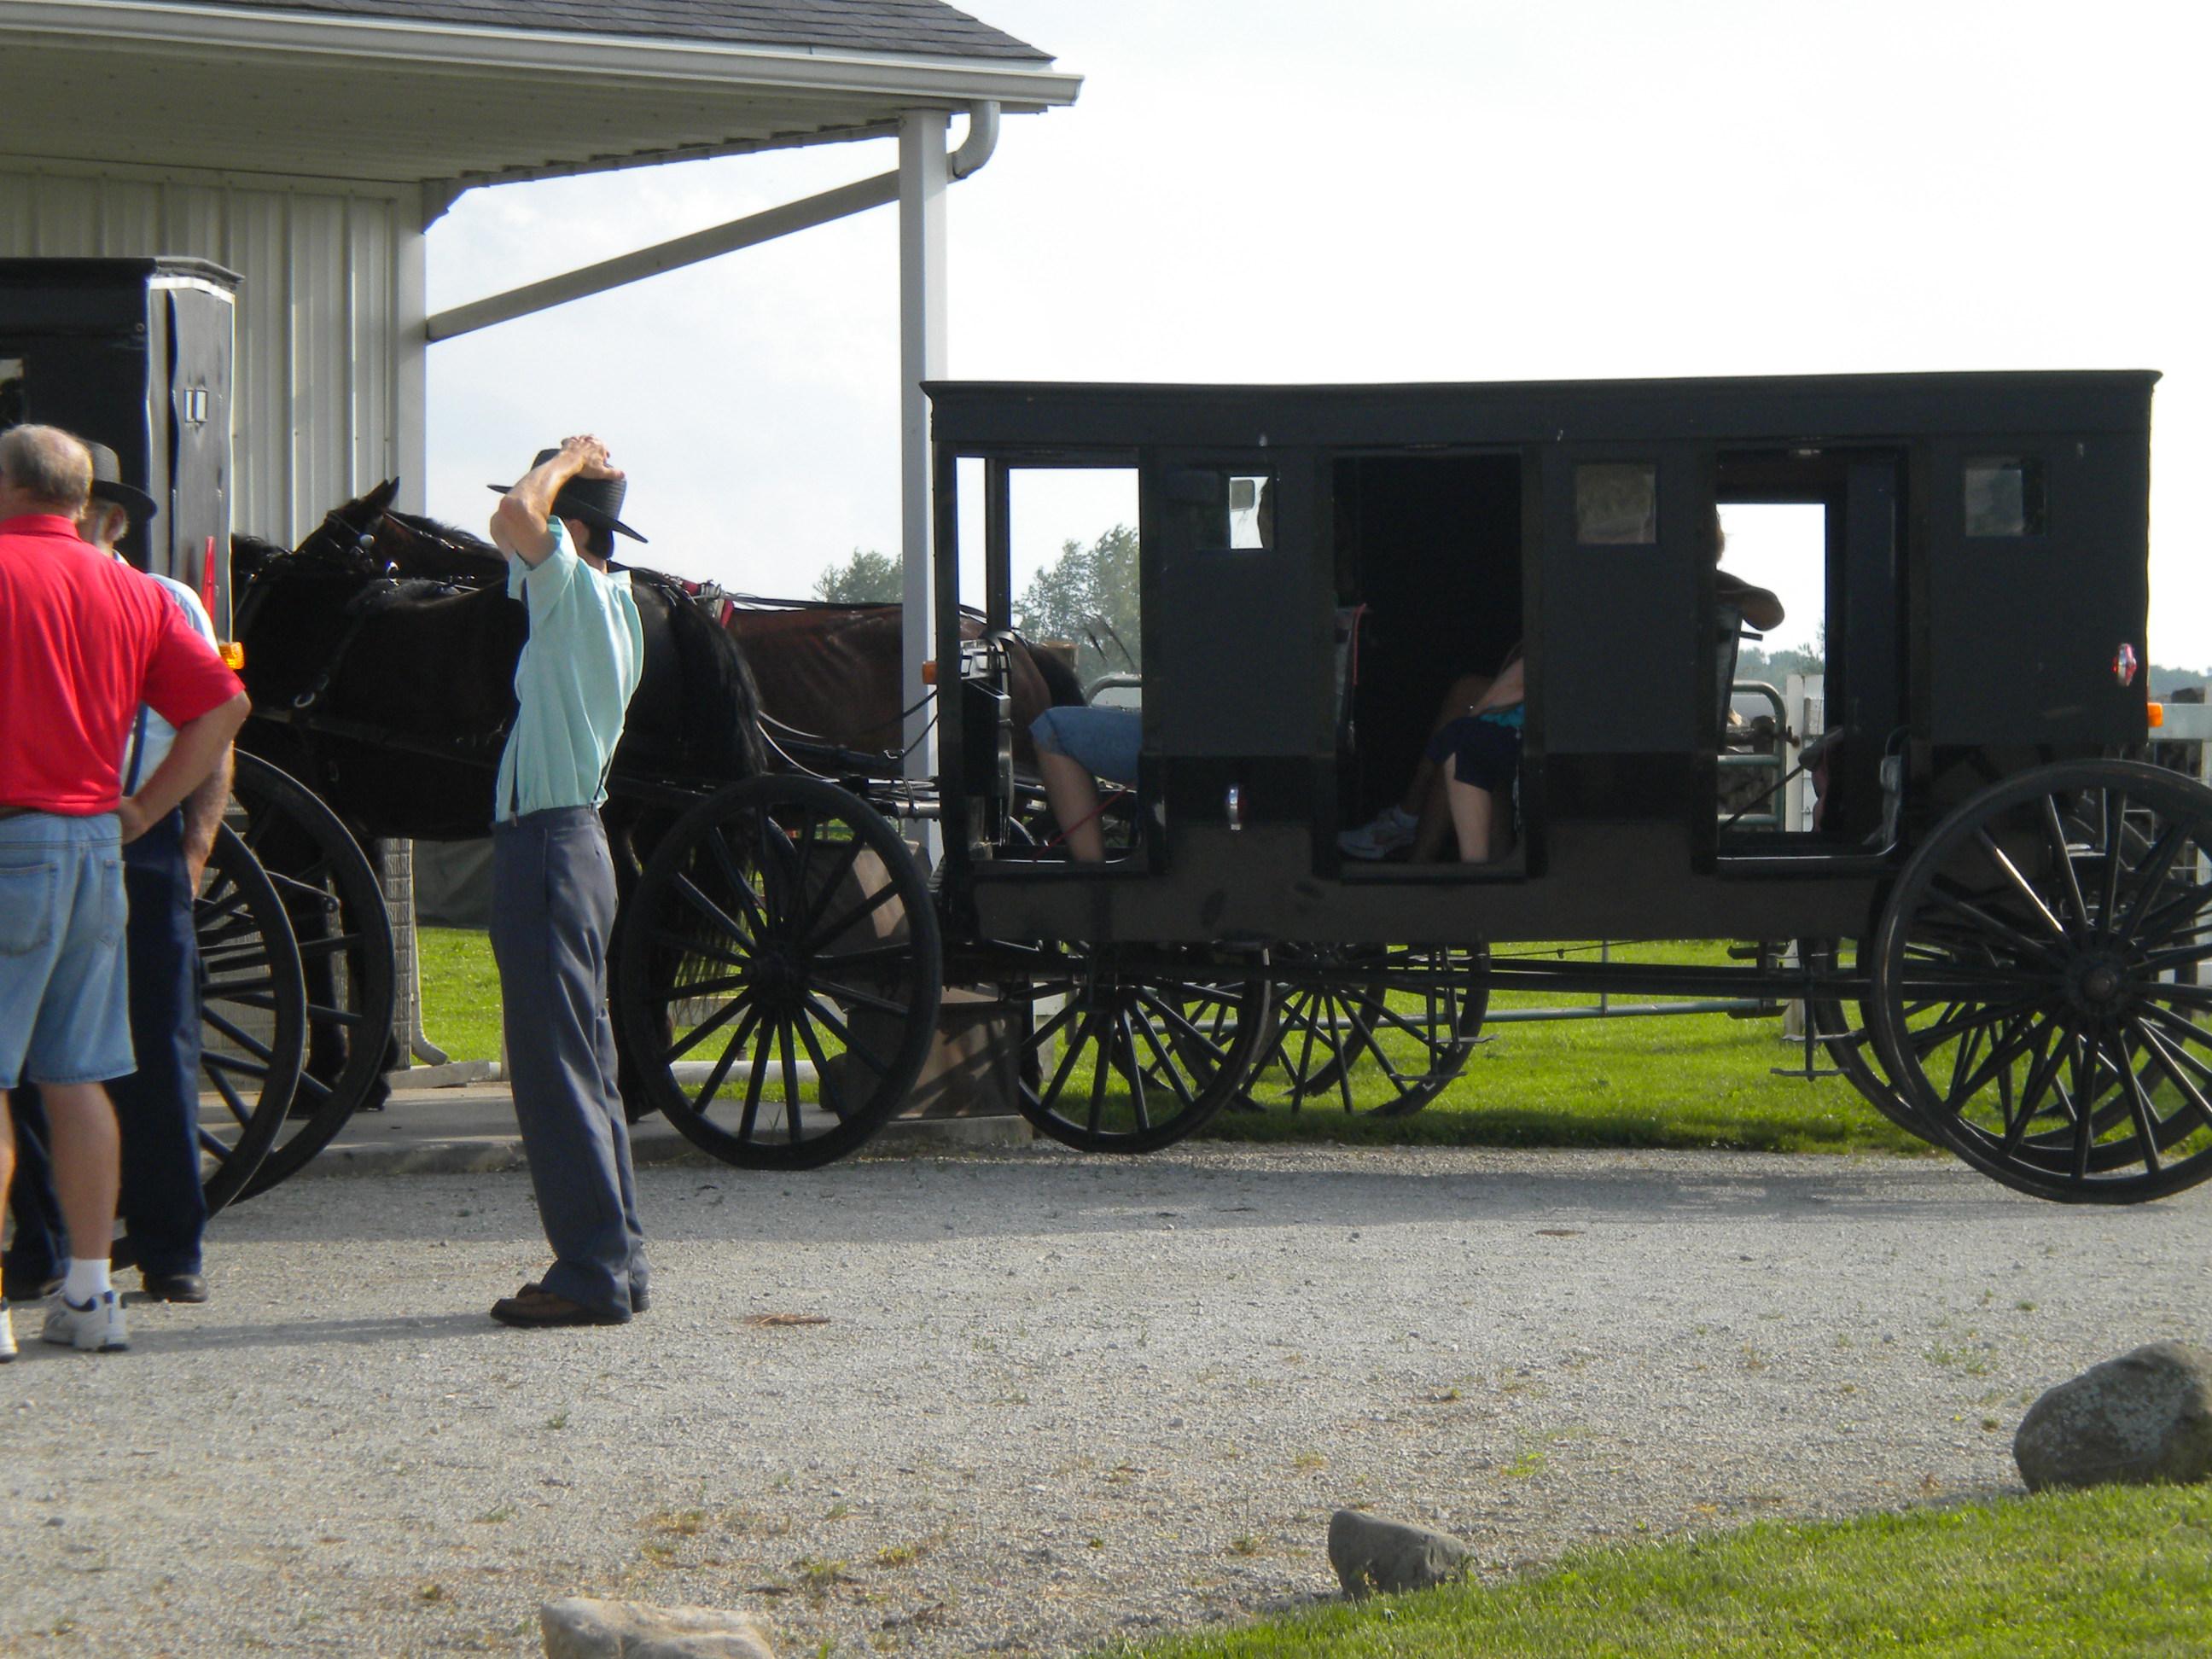 Amish Clothing Vannetta Chapman